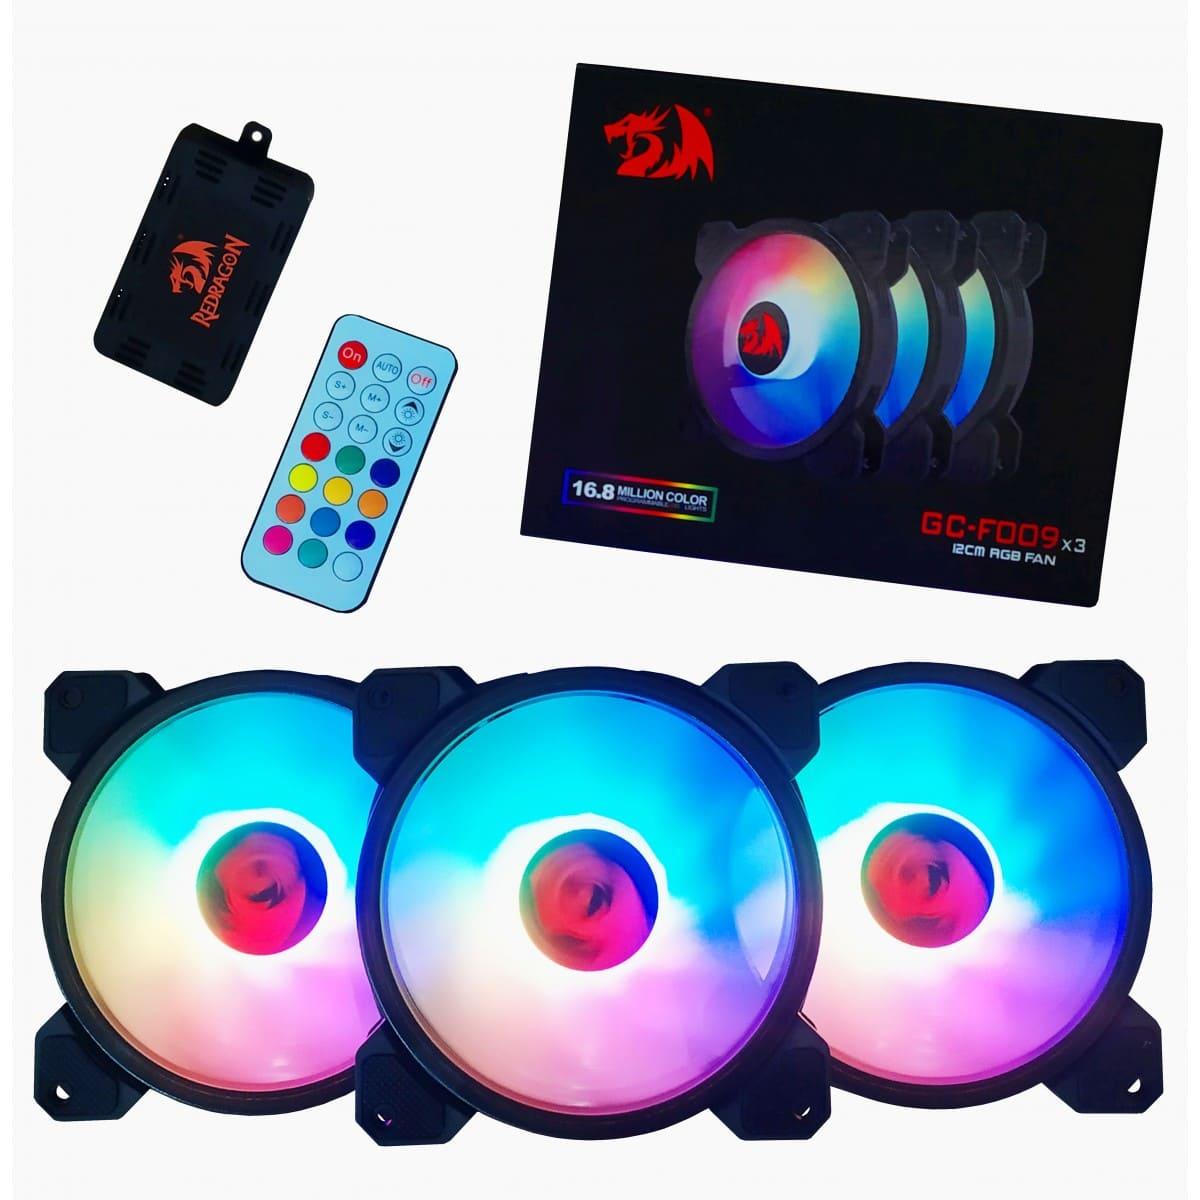 Kit fan com 3 unidades Redragon, RGB, 120mm, com Controladora - F009